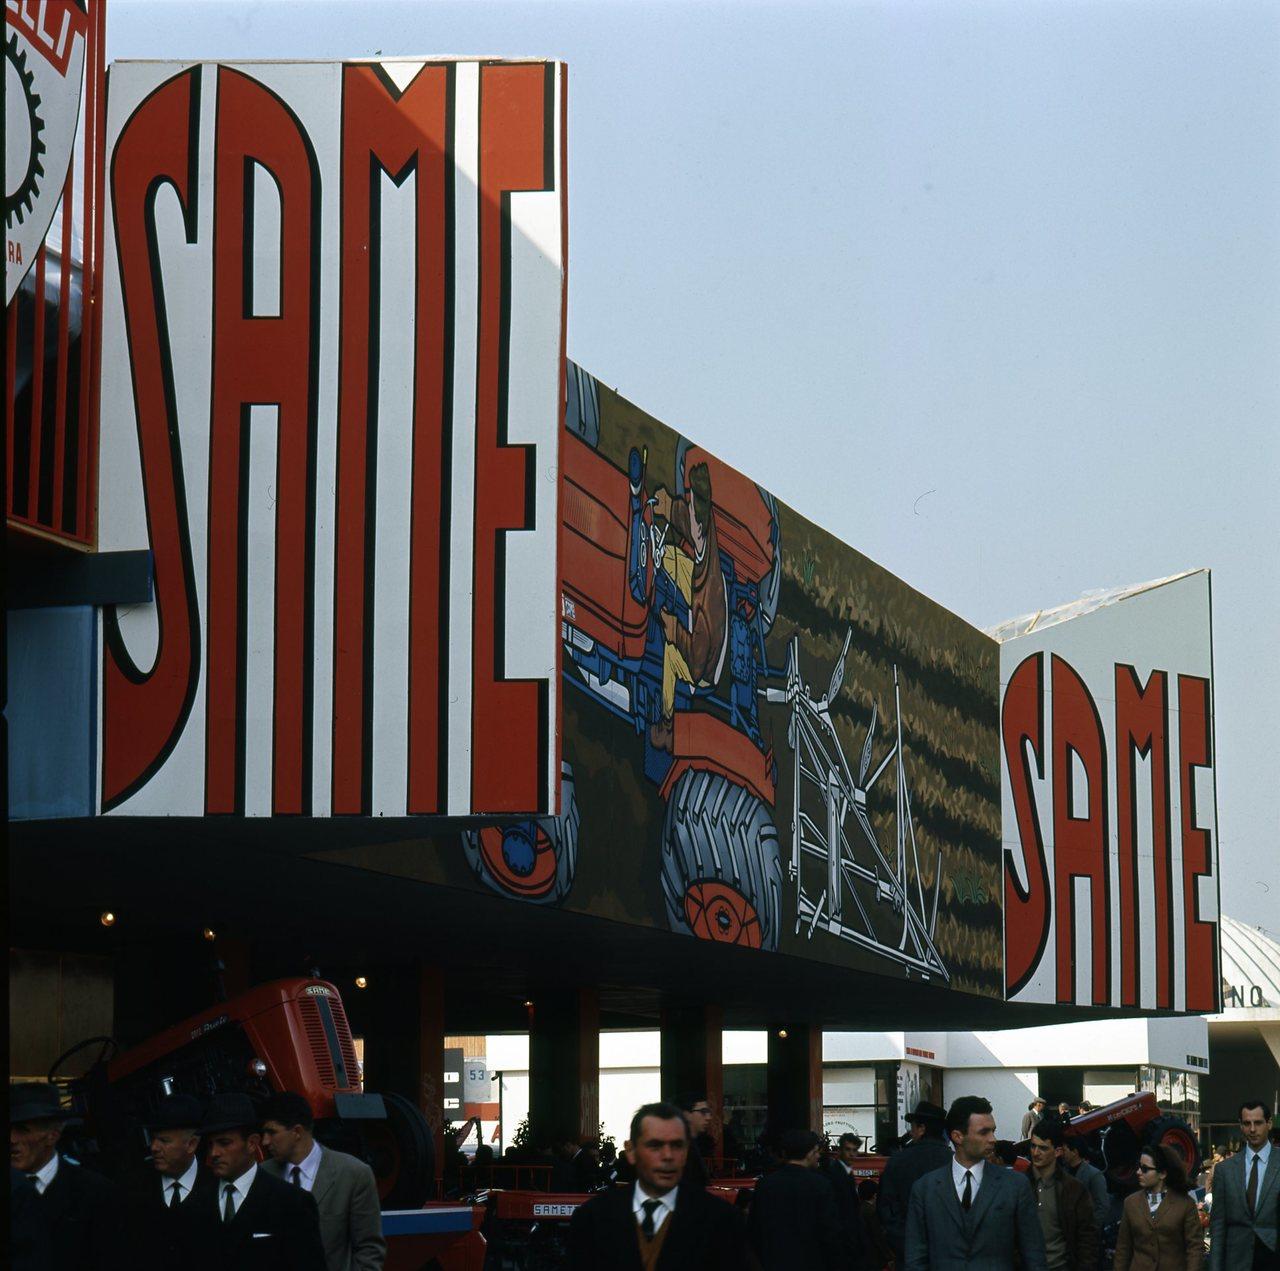 Fotocolor SAME Fiera di Verona, 1966